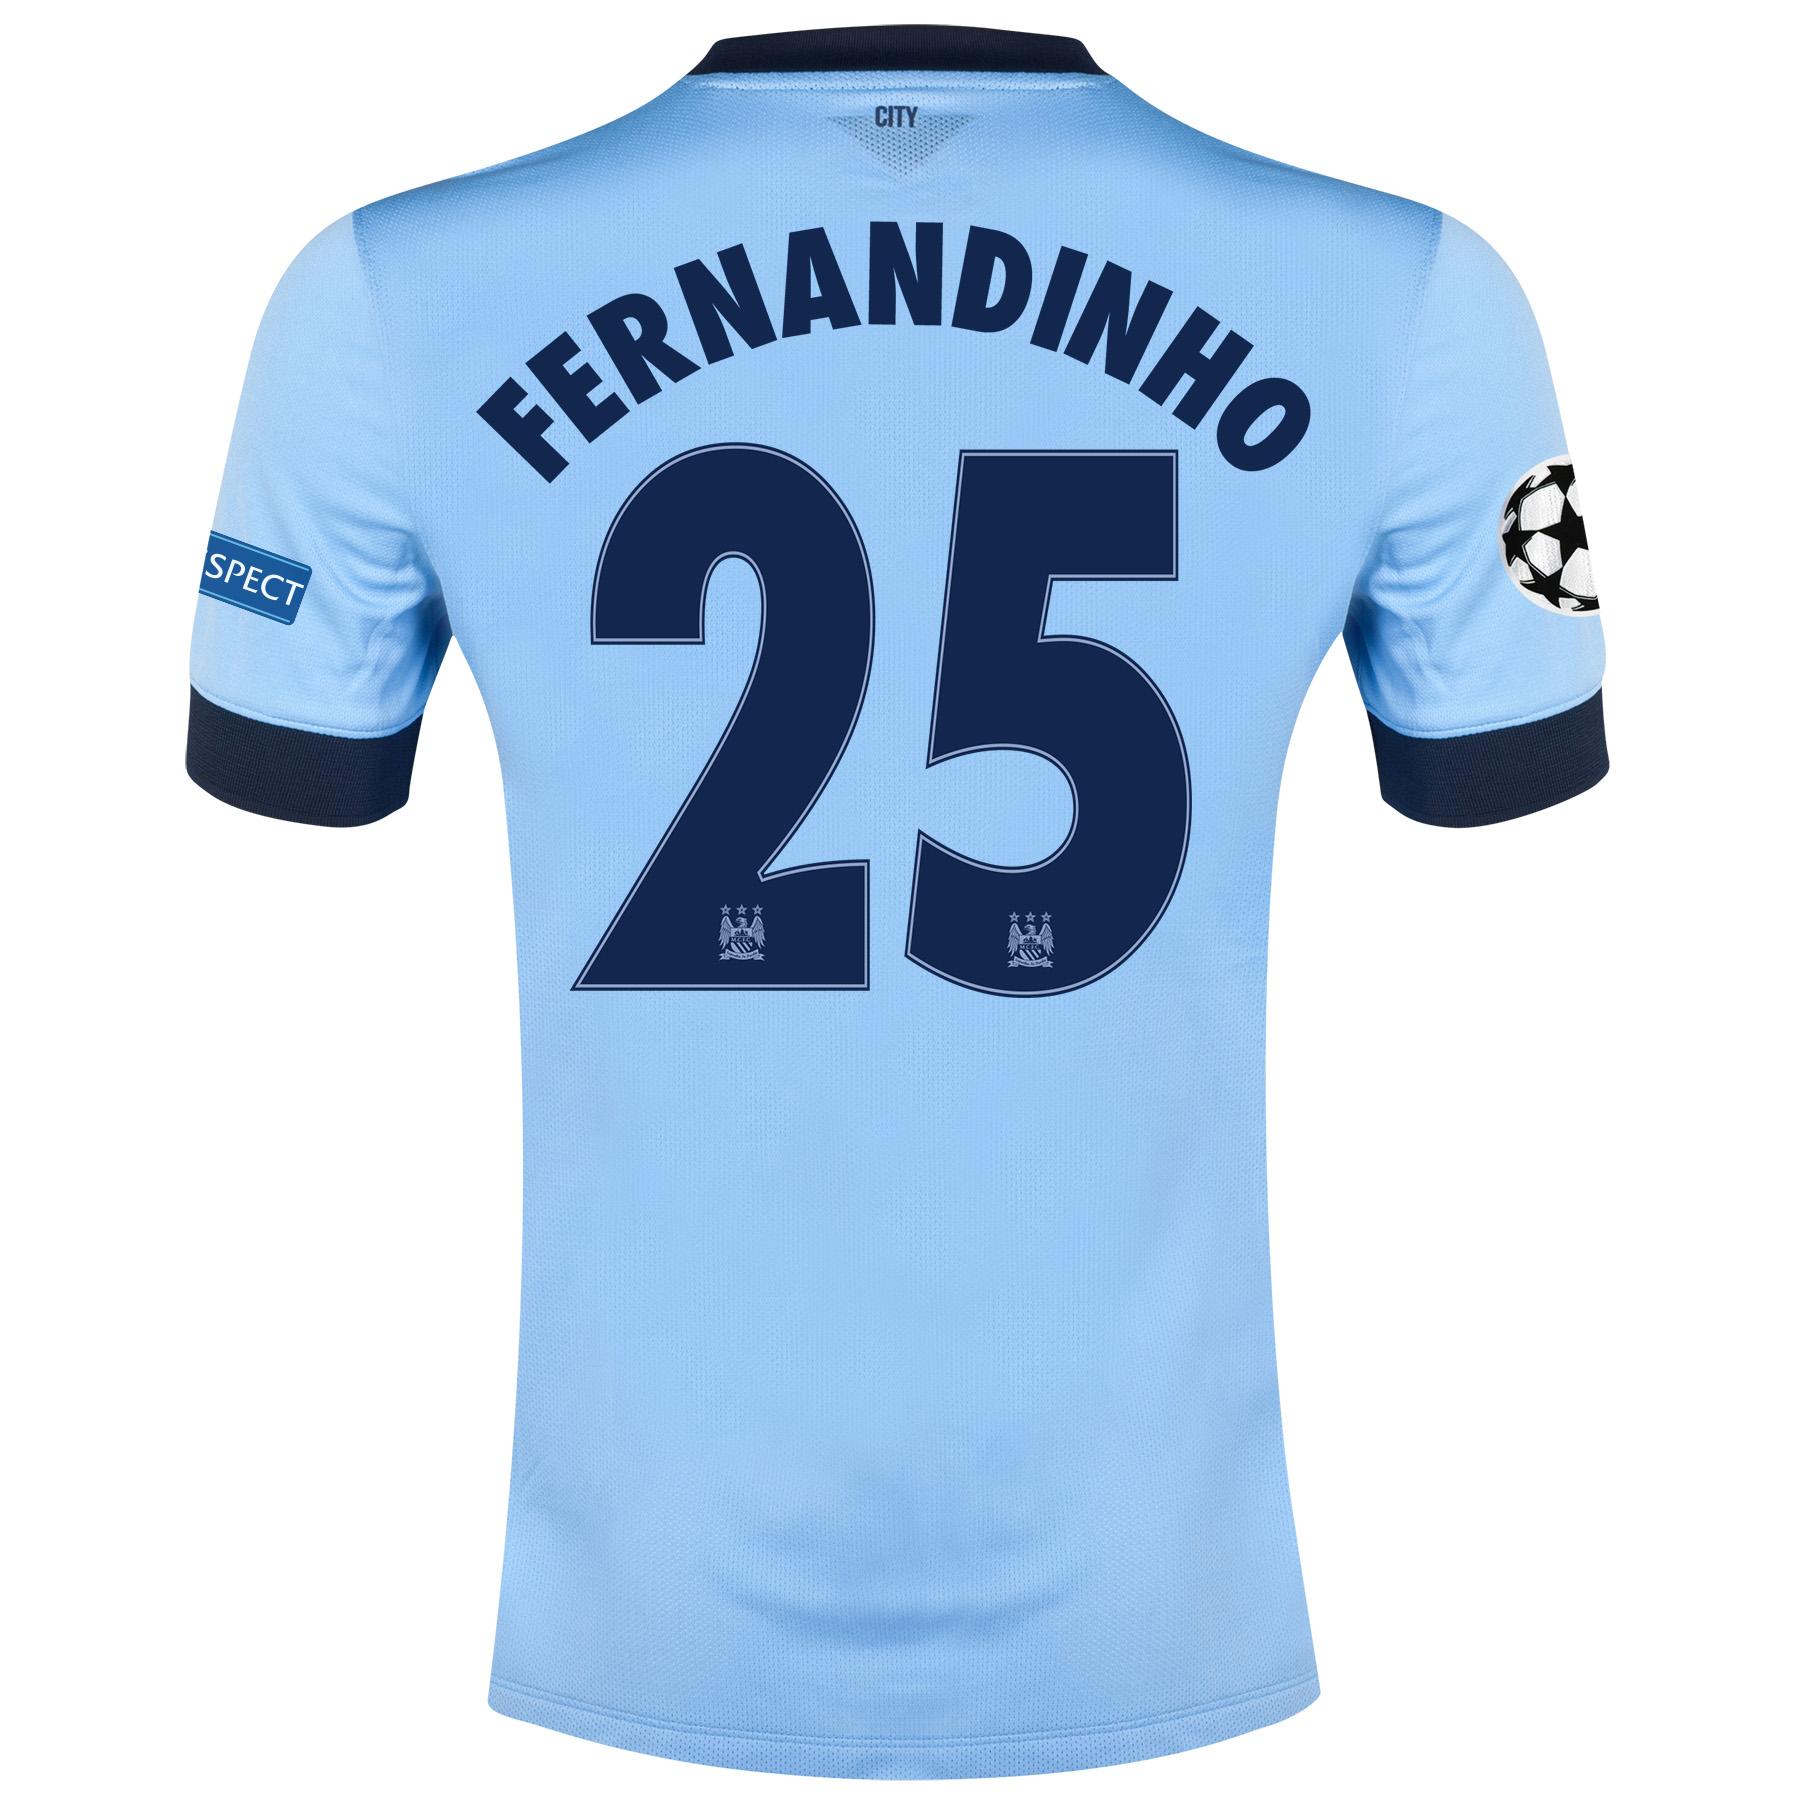 Manchester City UEFA Champions League Home Shirt 2014/15 - Kids Sky Blue with Fernandinho 25 printing